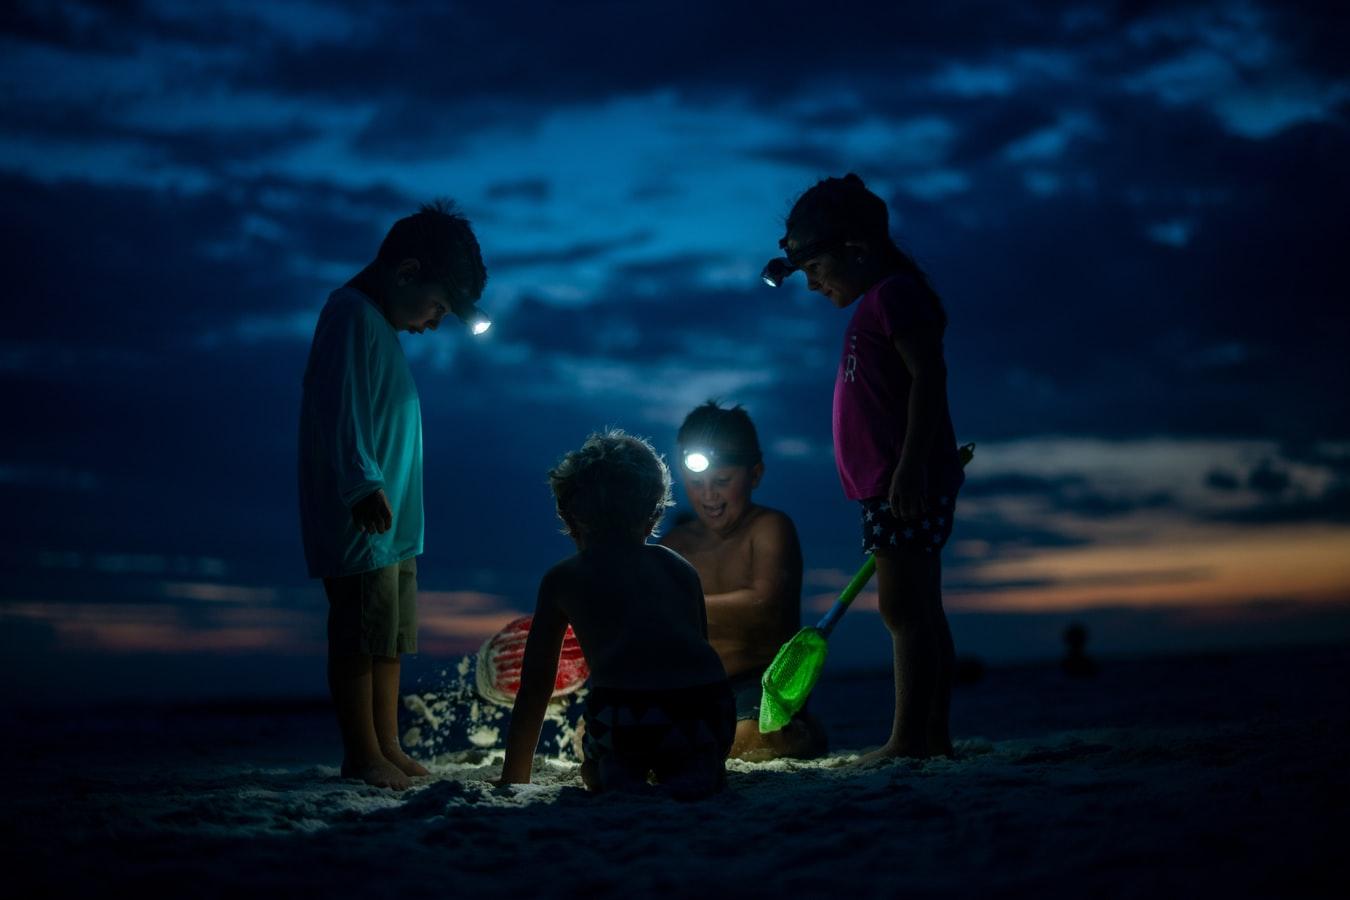 Best Flashlight for Kids in 2021